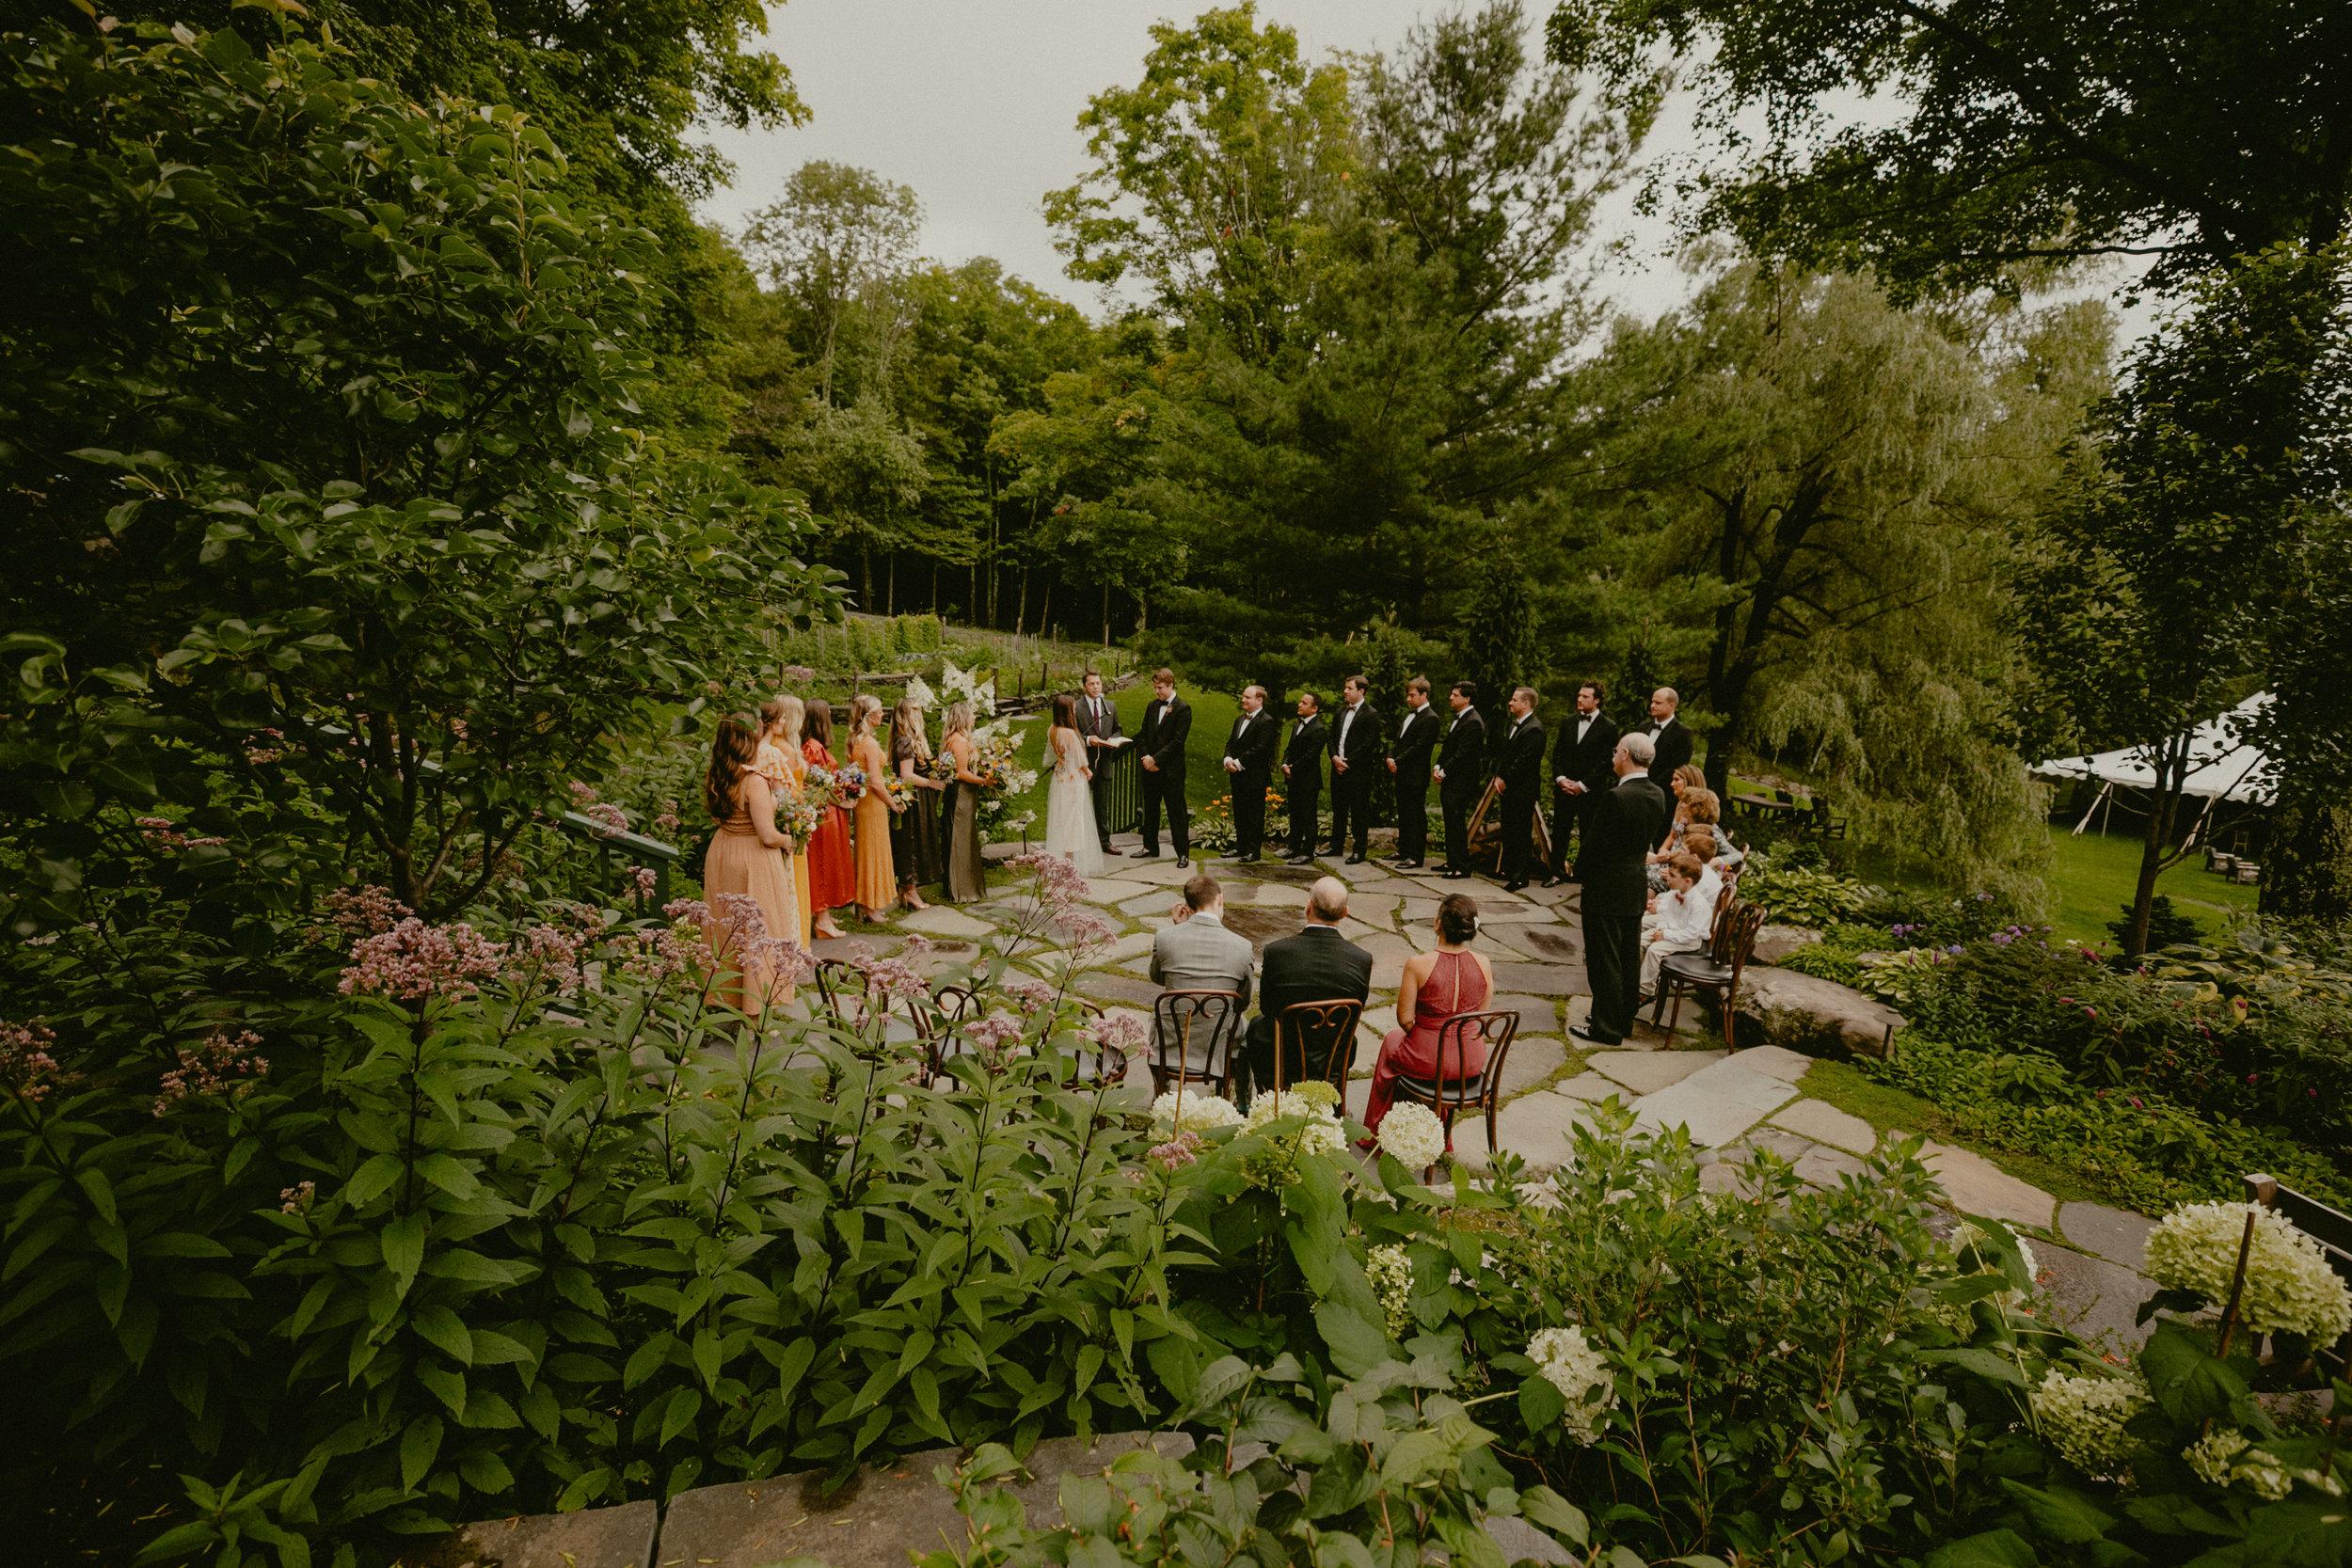 DEER_MOUNTAIN_INN_WEDDING_CHELLISE_MICHAEL_PHOTOGRAPHY-1361.jpg